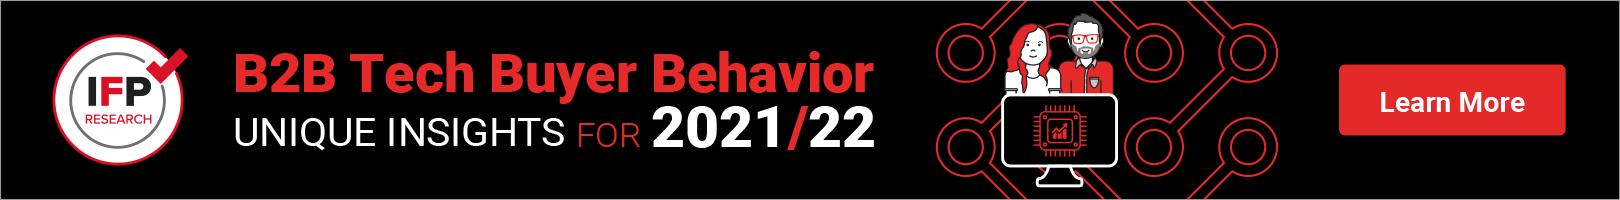 B2B Tech Buyer Behavior WP banner